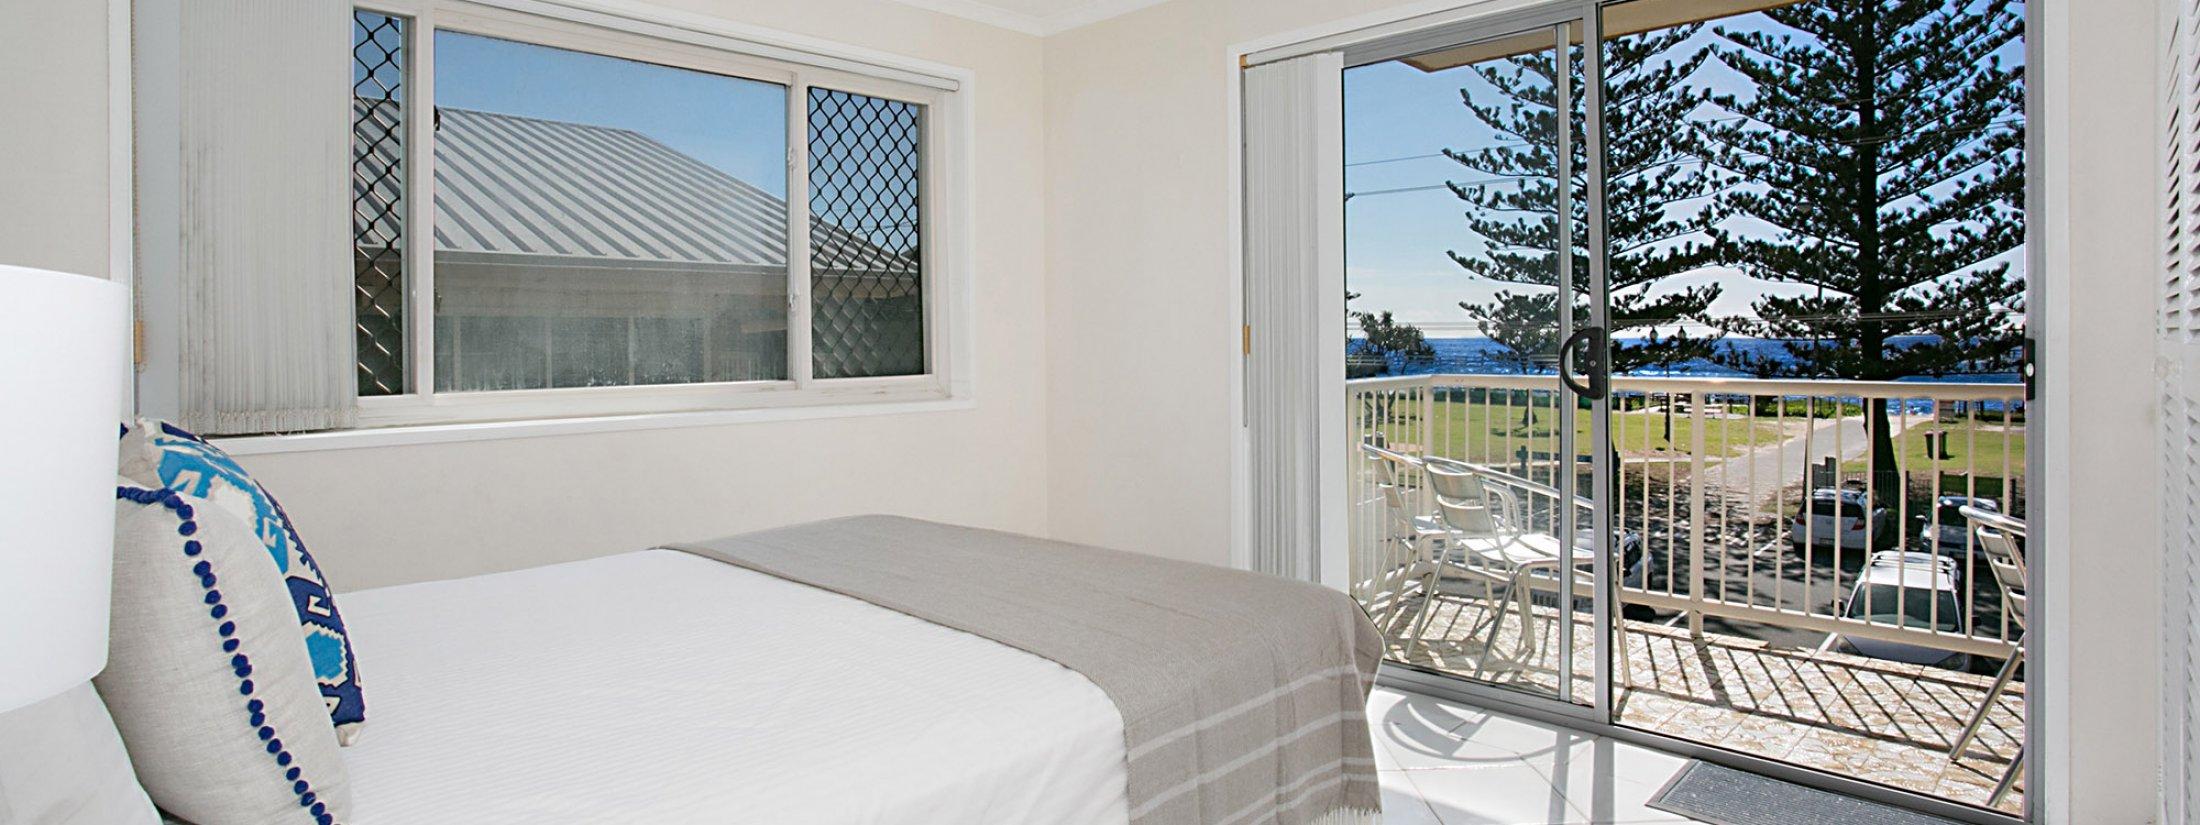 Camden House #11 - Gold Coast - Bedroom 2